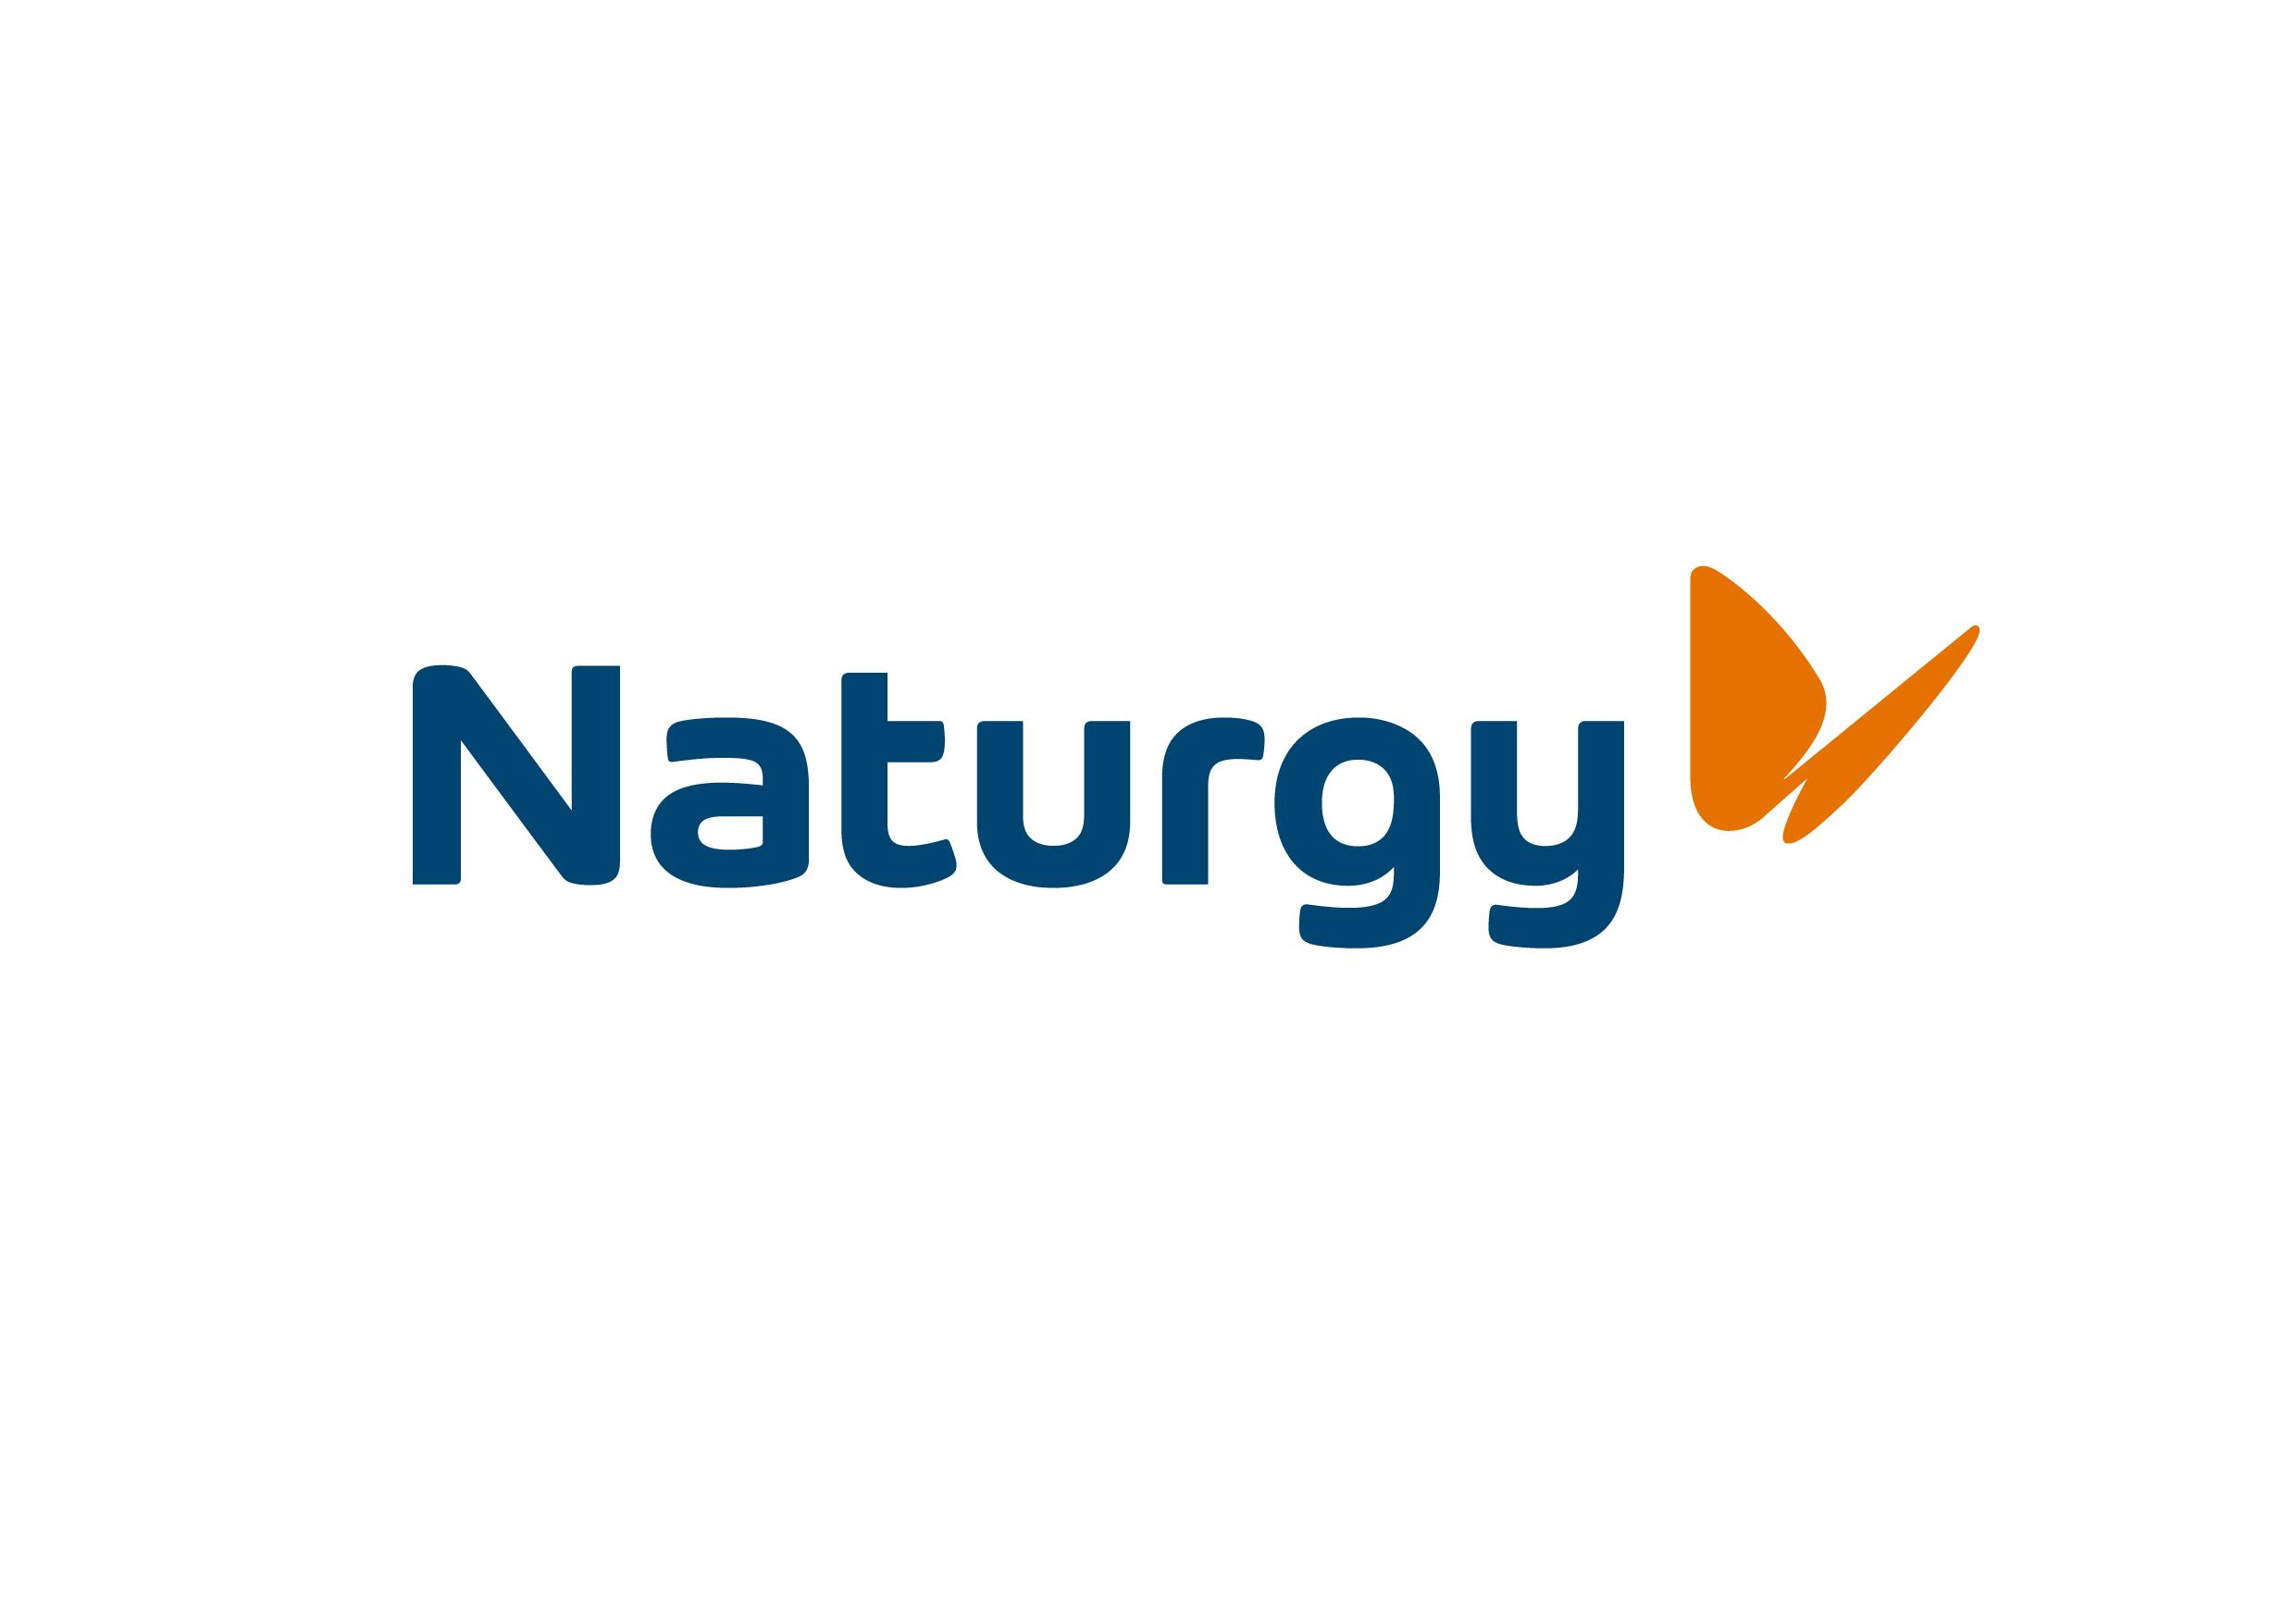 Naturgy_RGB_Principal_Positiva070518.jpg